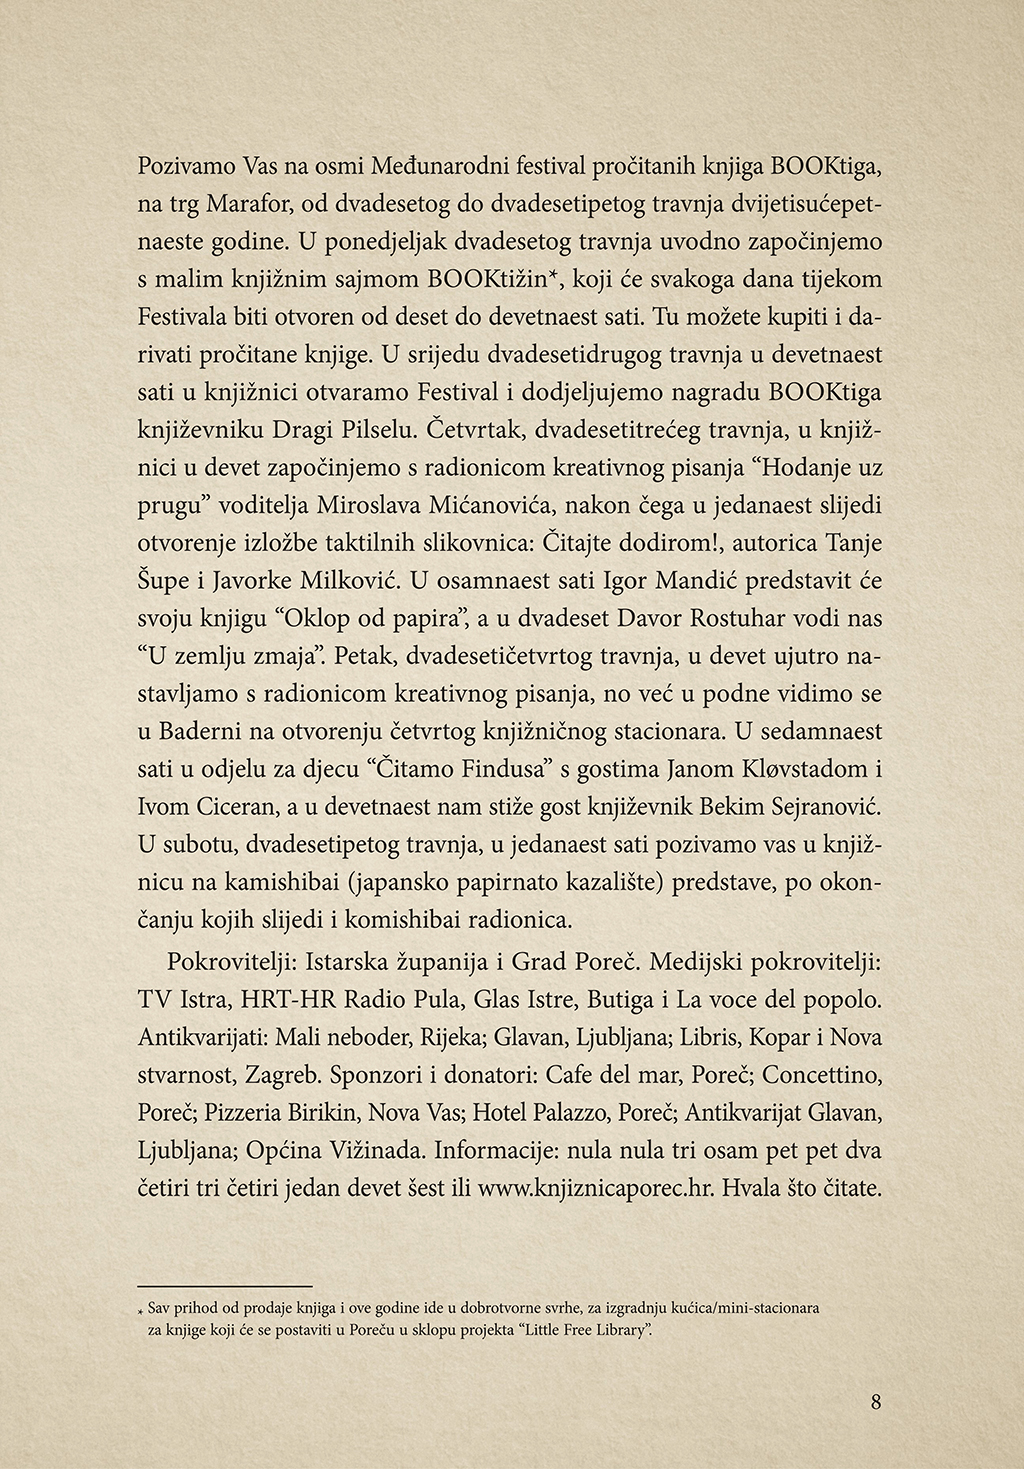 Booktiga, Čitanje, Plakat, Studio Sonda, Sonda, Hrvatski dizajn, Dizajn